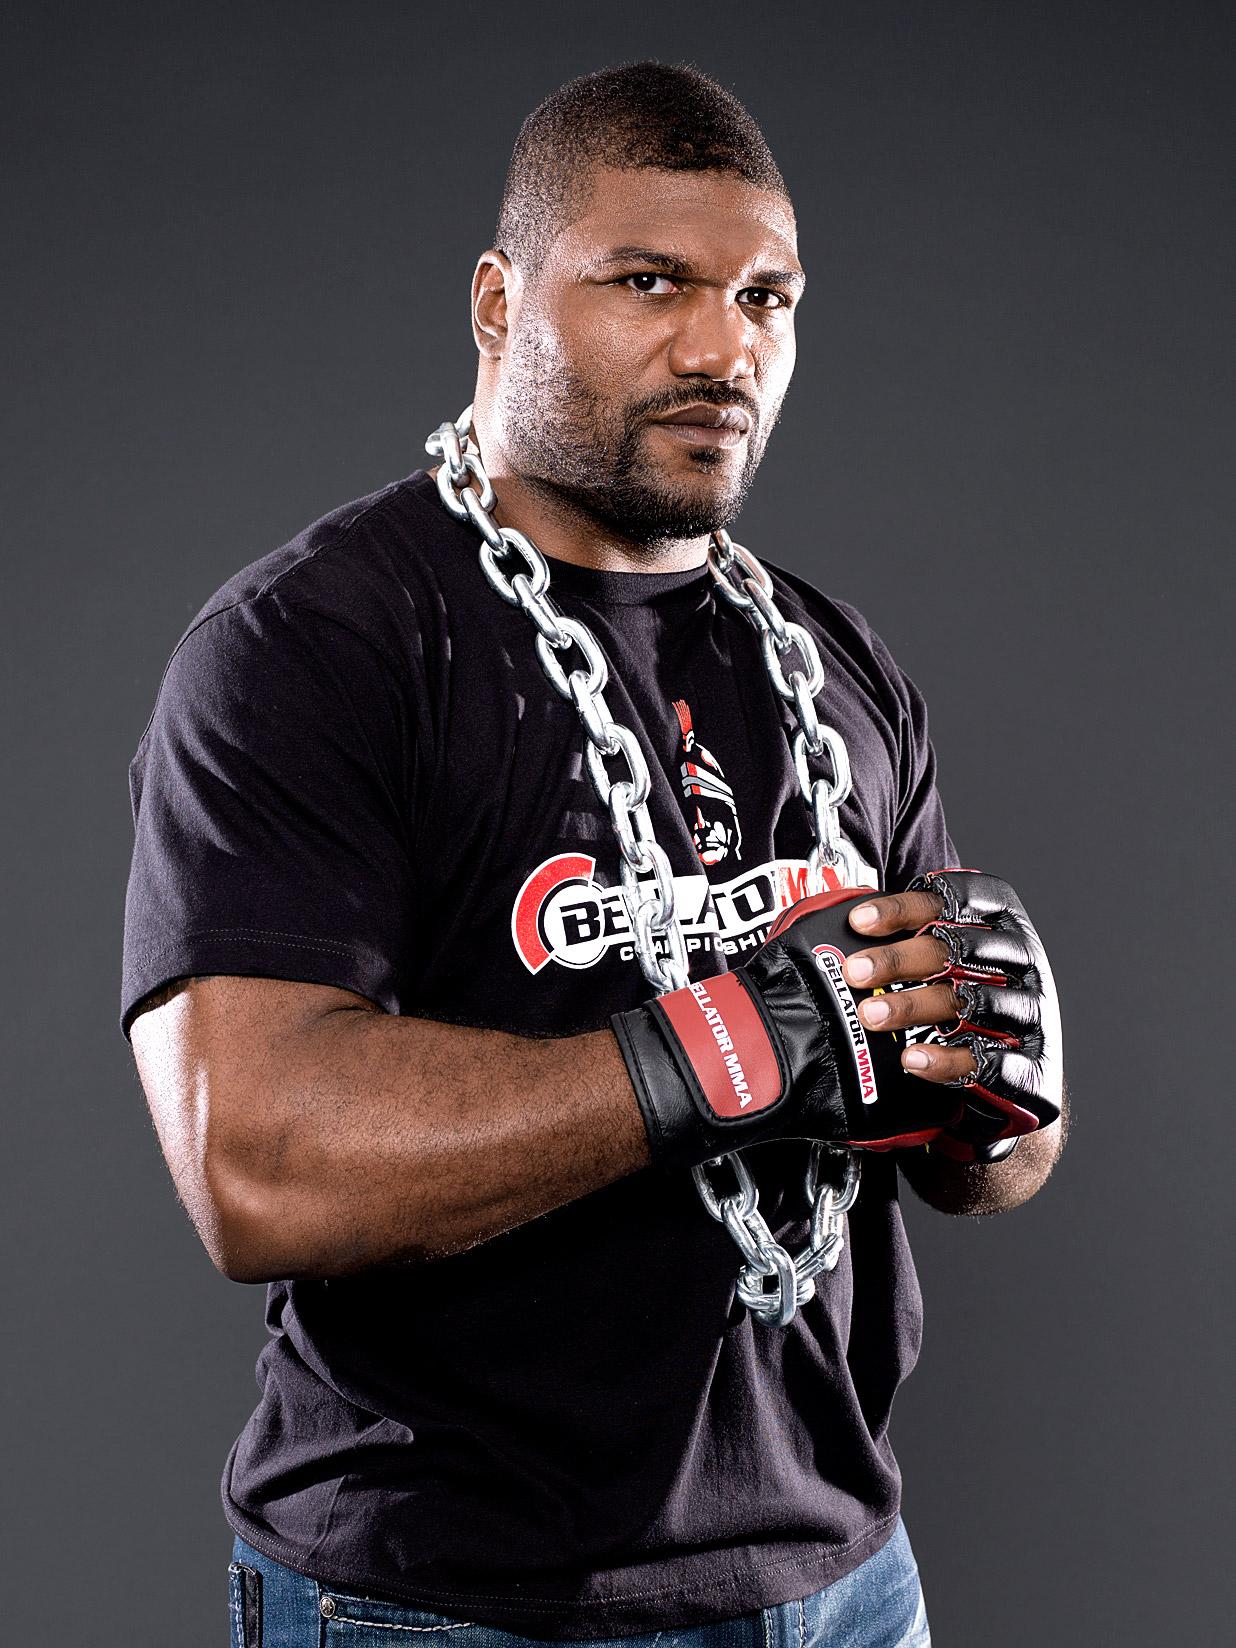 Quinton 'Rampage' Jackson Tells Inside MMA He Still Wants ...